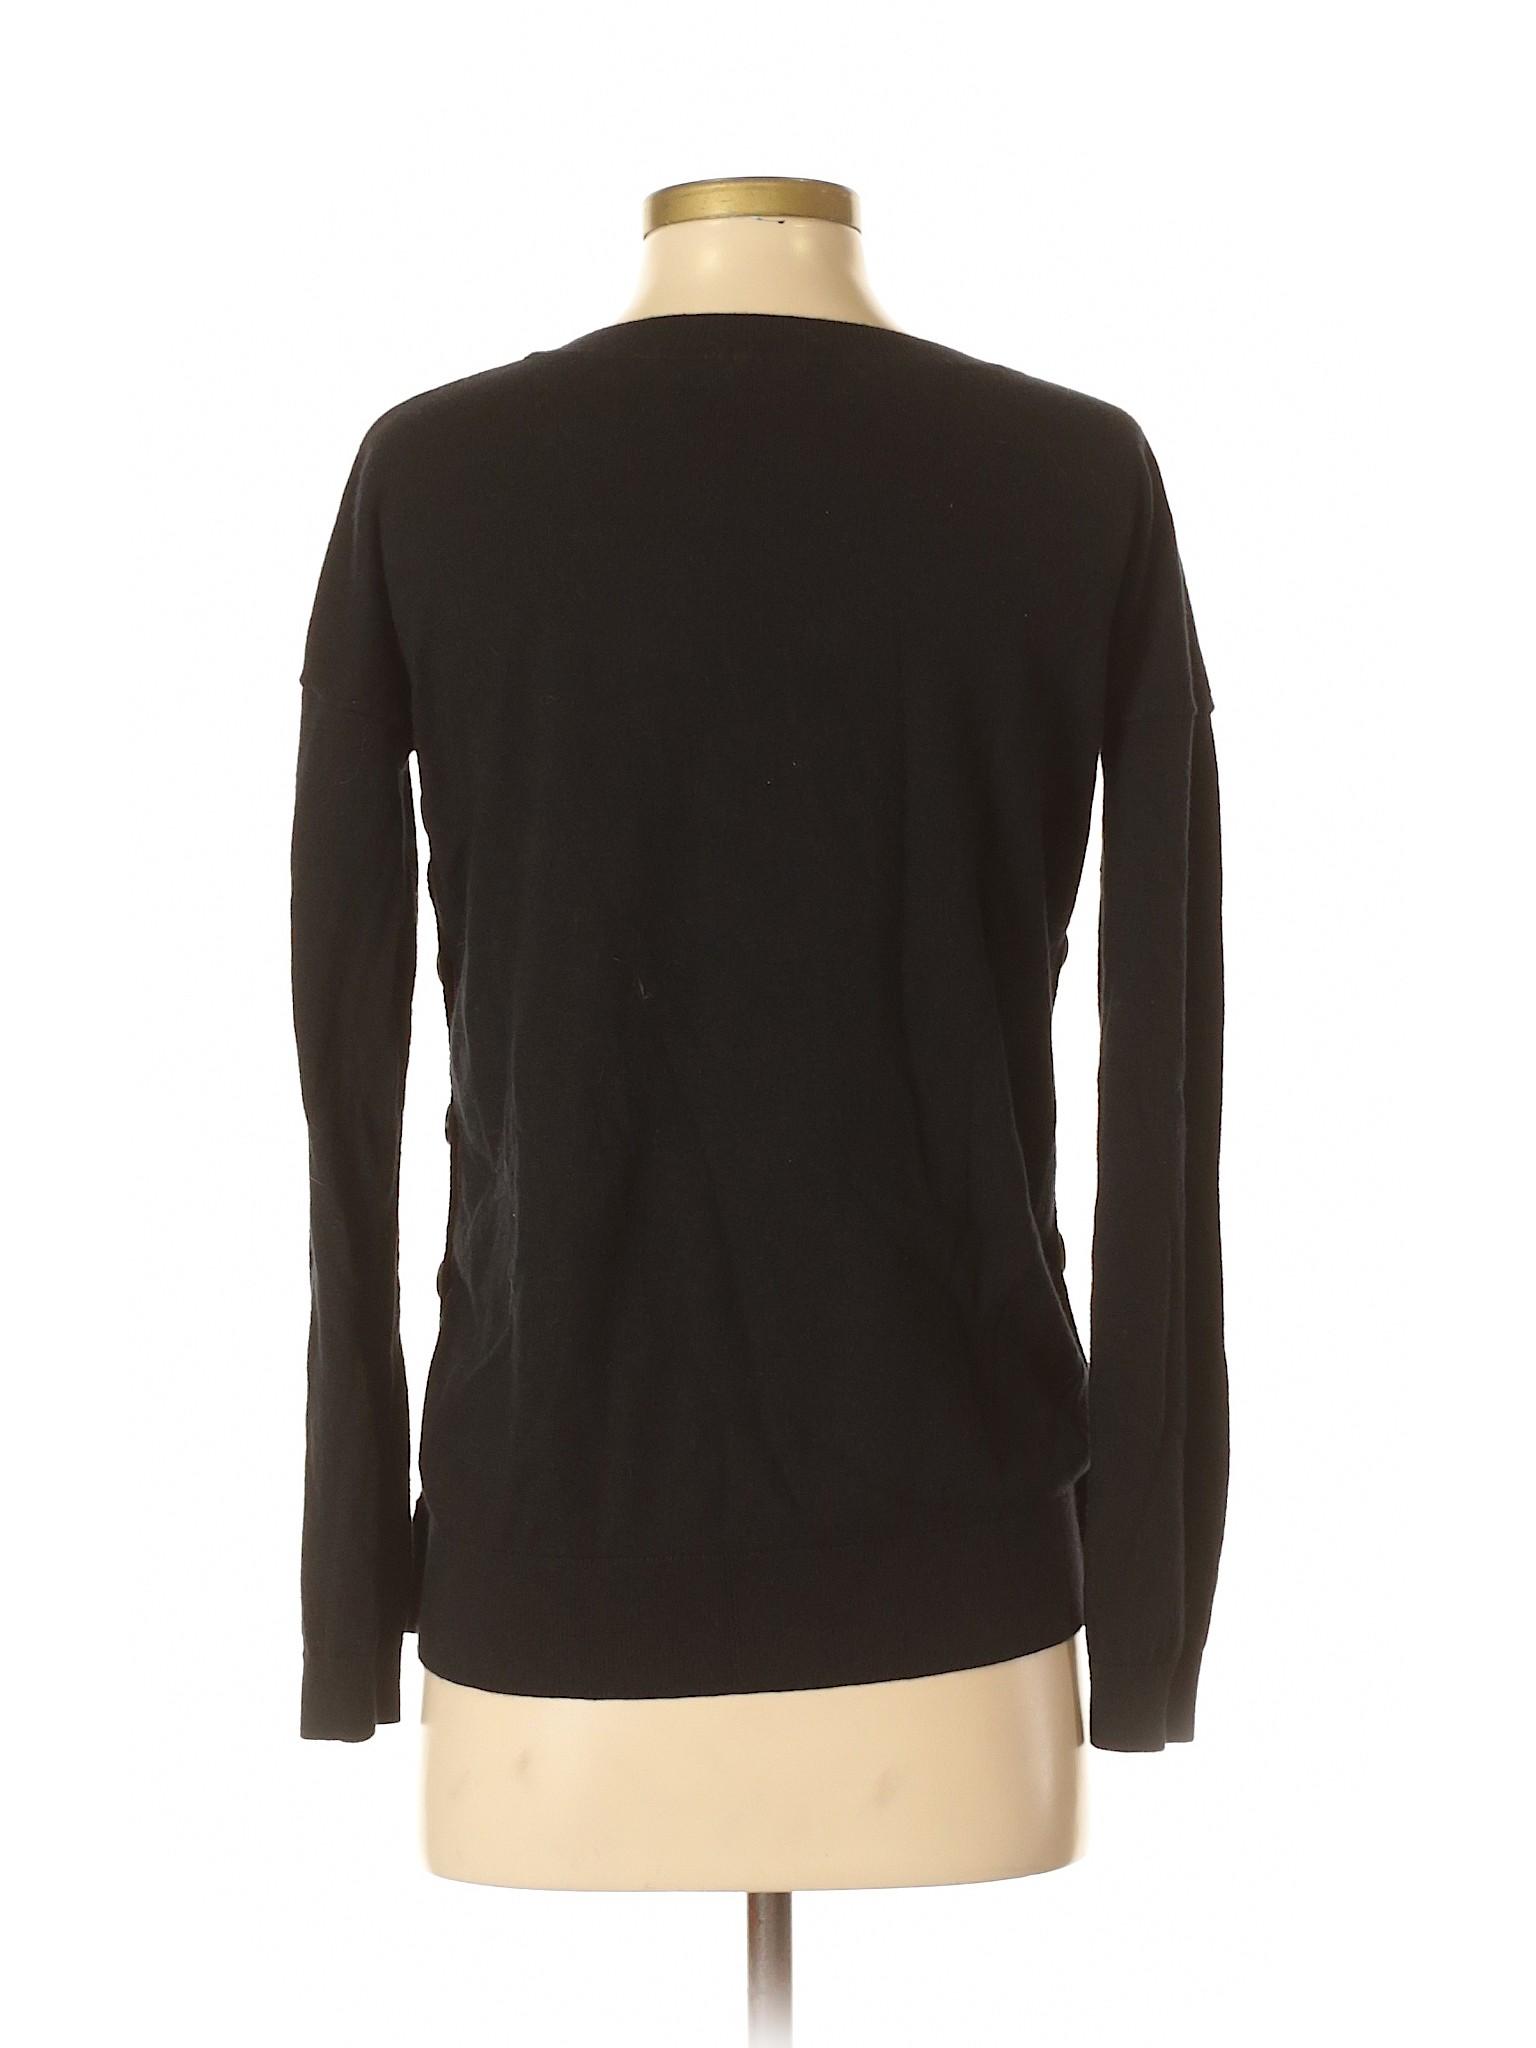 Wool Boden Pullover winter Sweater Boutique EZ5qzW5